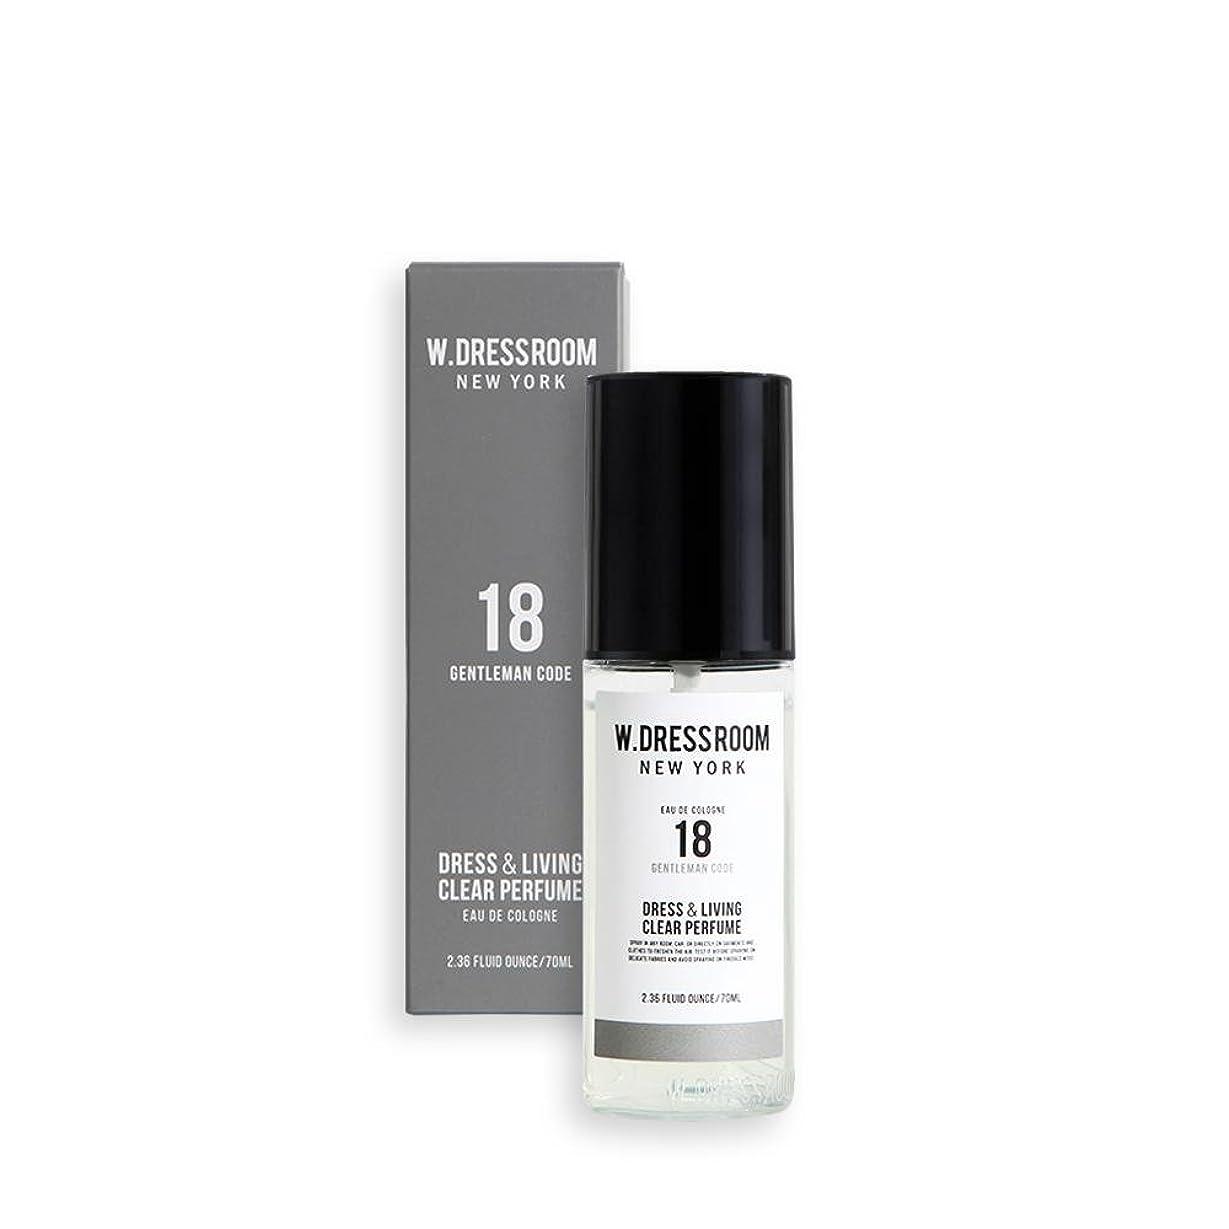 W.DRESSROOM Dress & Living Clear Perfume fragrance 70ml (#No.18 Gentleman Code)/ダブルドレスルーム ドレス&リビング クリア パフューム 70ml (#No.18 Gentleman Code)